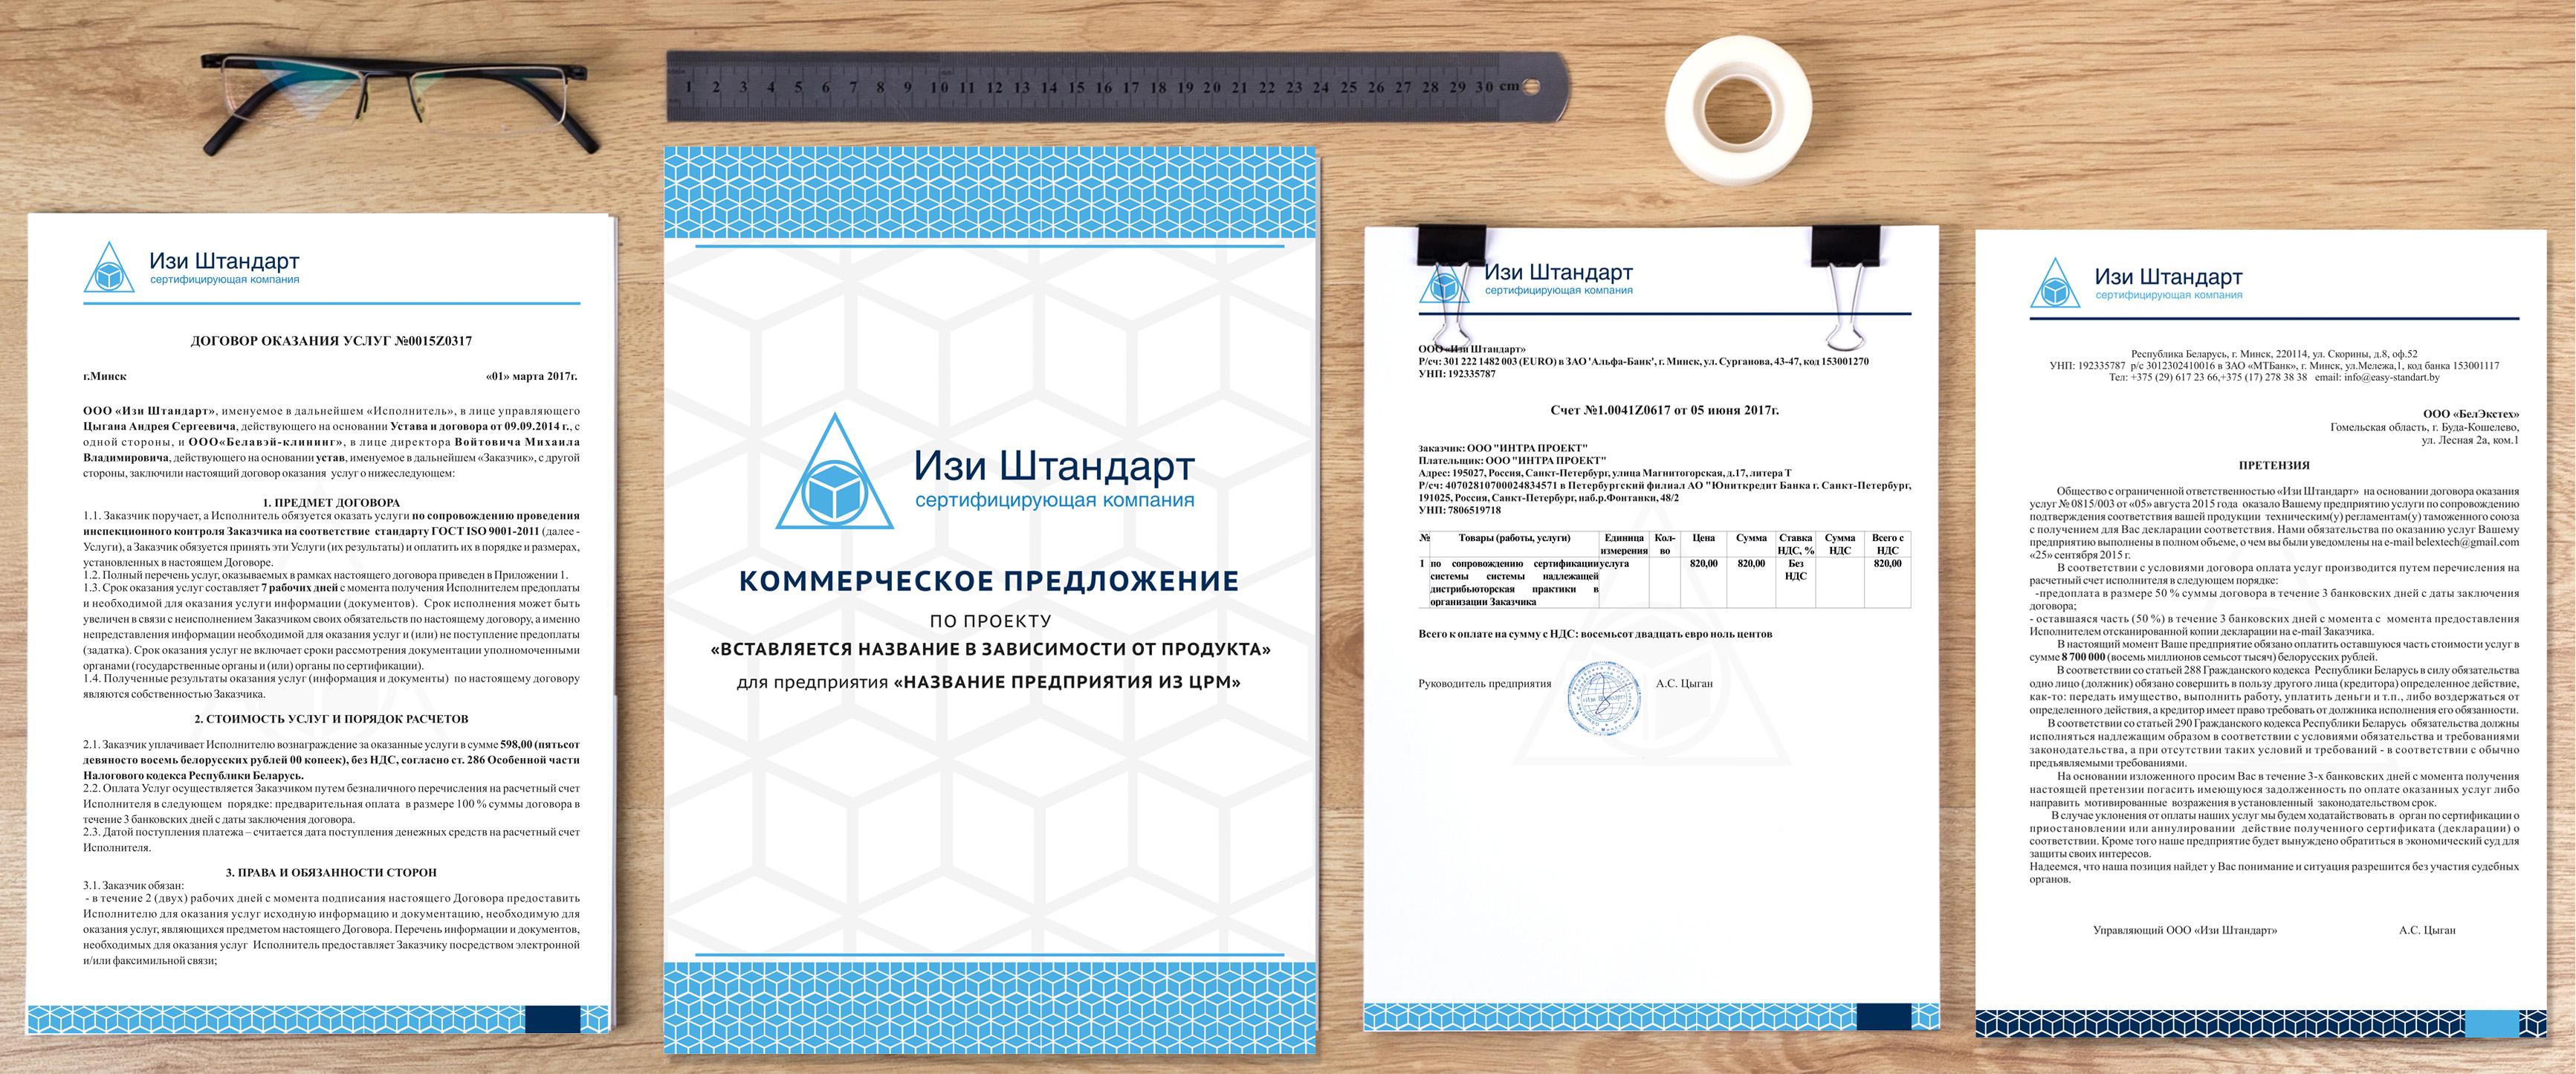 Оформление фирменных документов фото f_13259485a8fc0d30.jpg